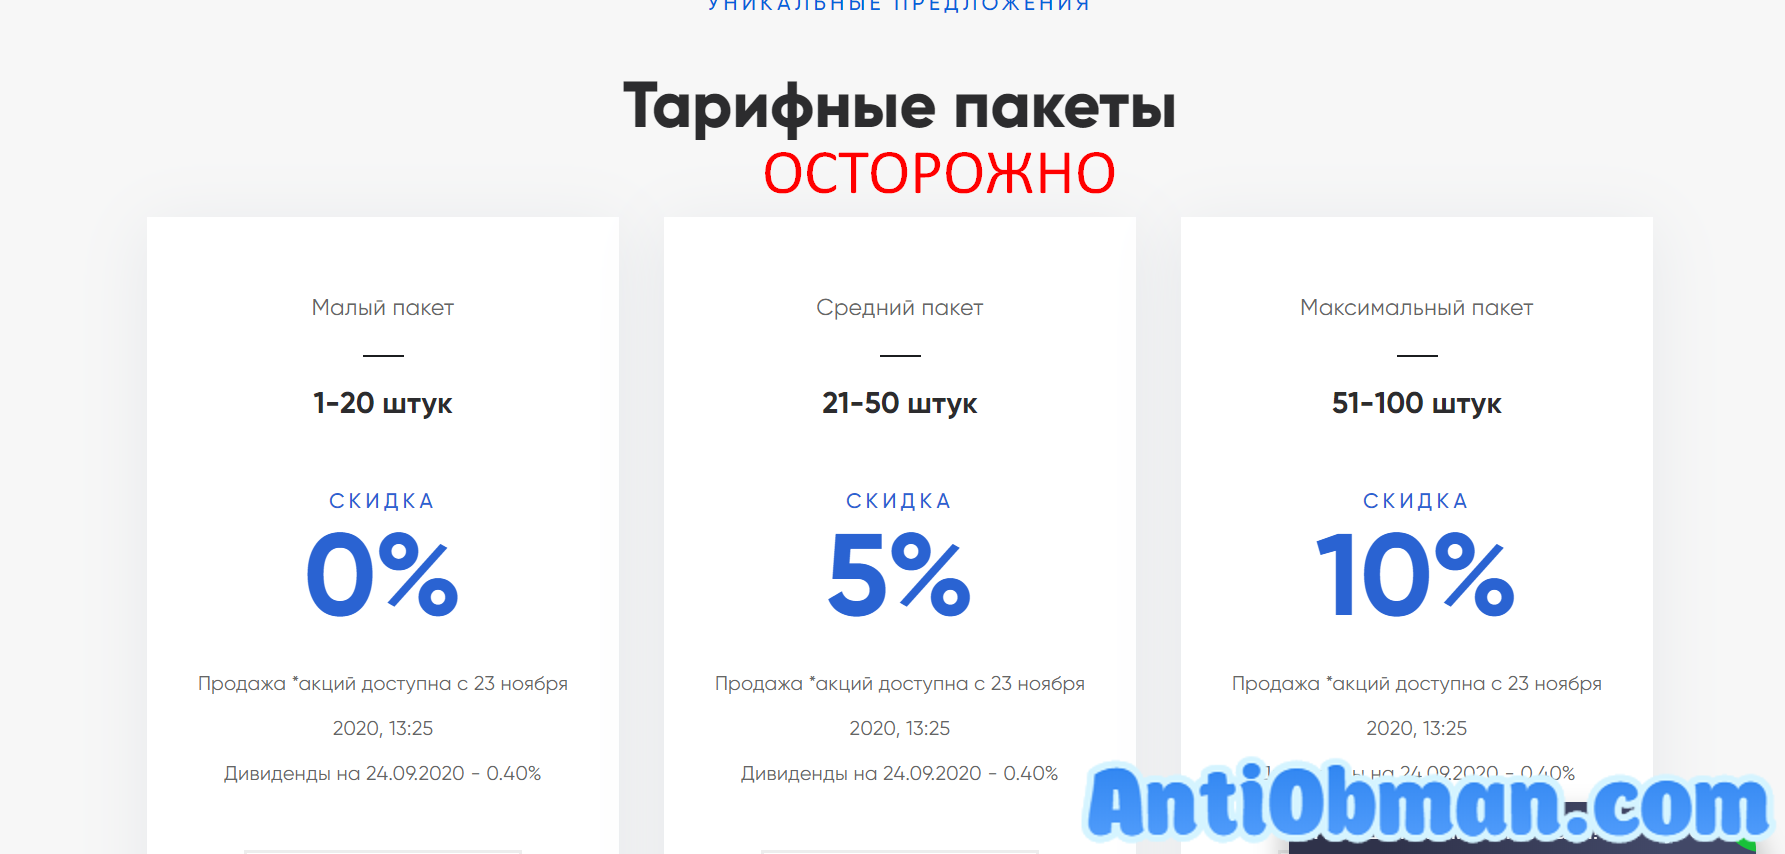 Avitex (avitex.company) - отзывы и проверка